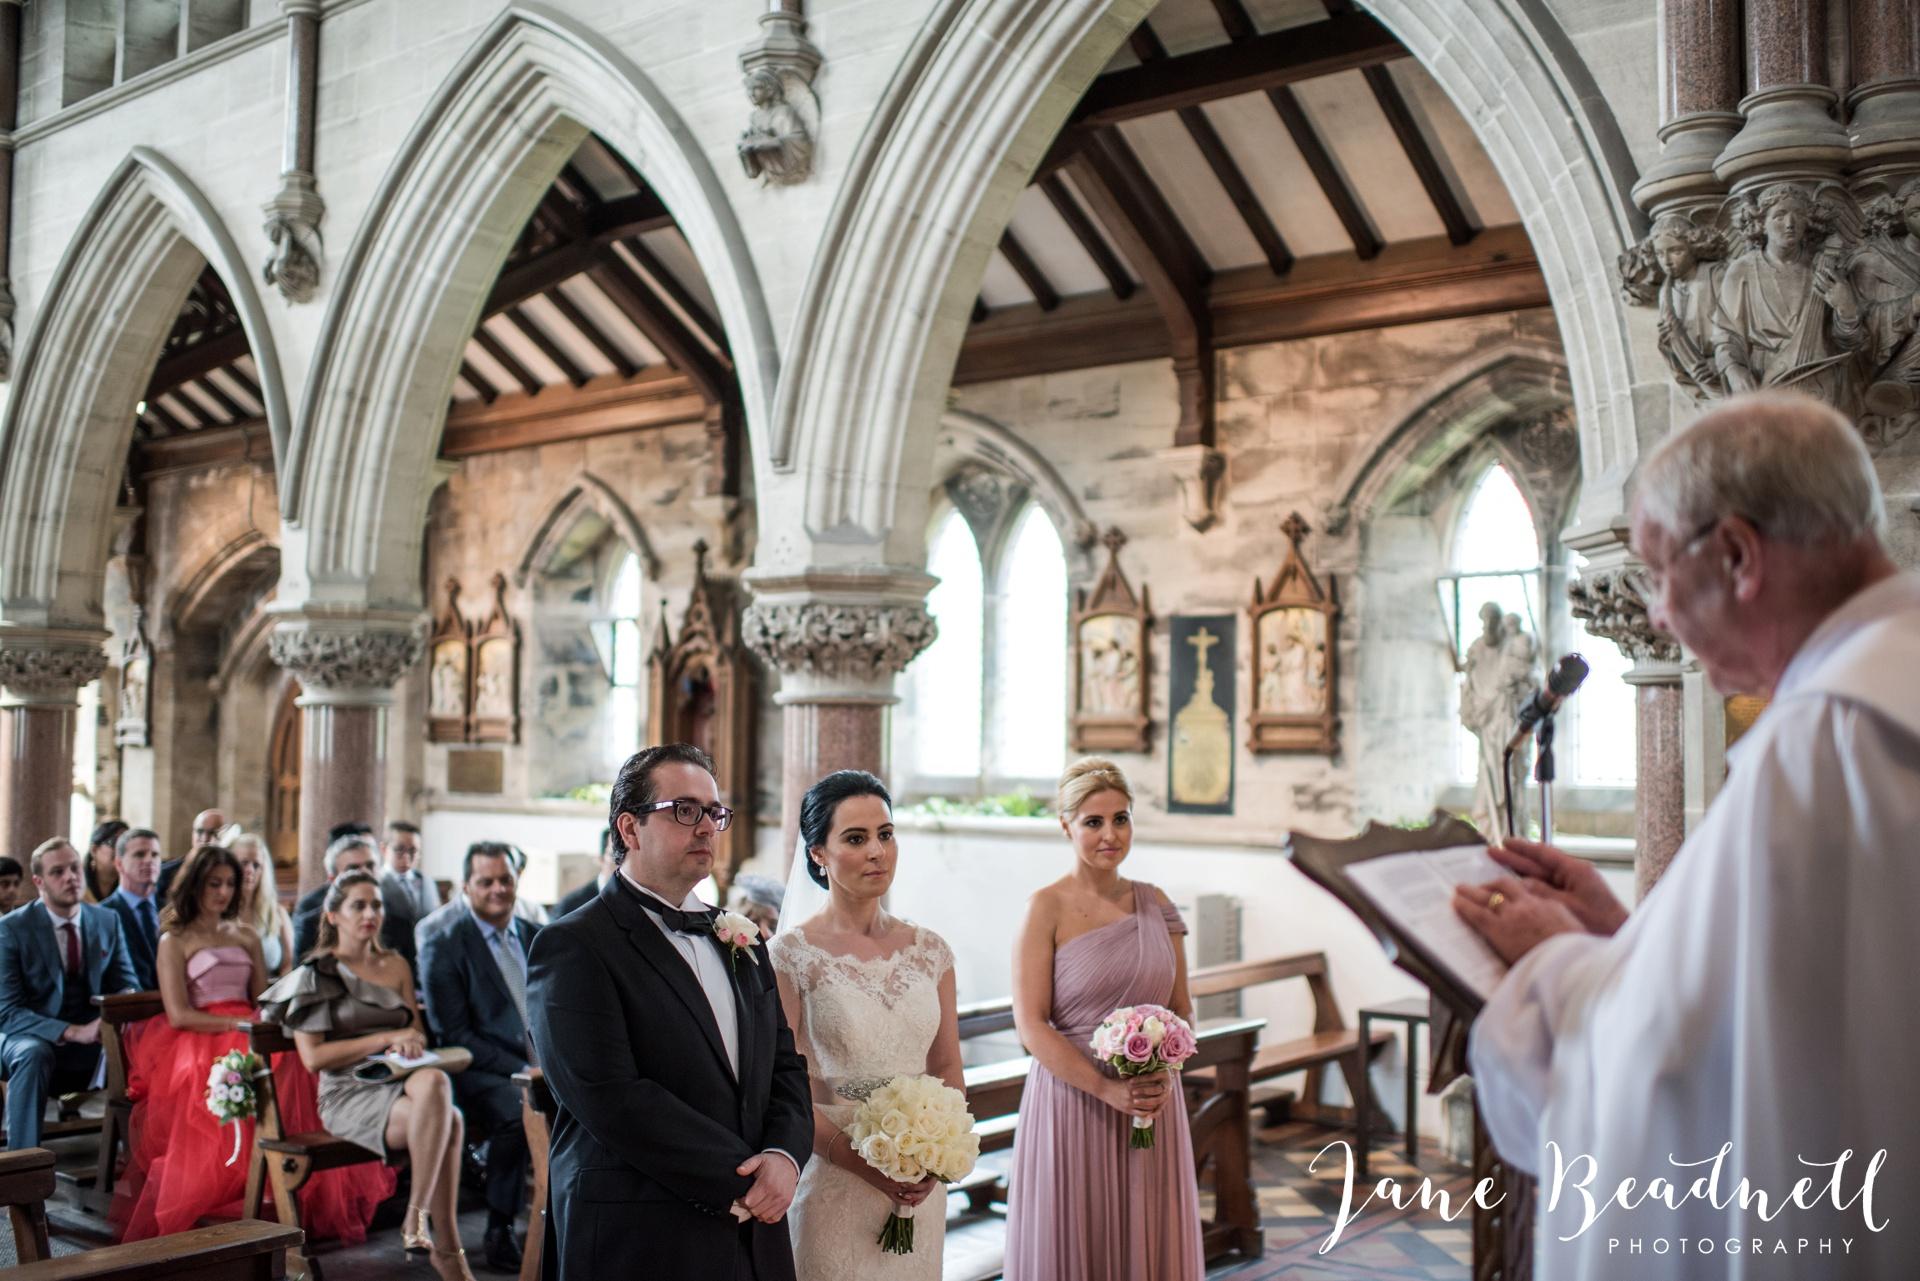 Jane Beadnell fine art wedding photographer Rudding Park Harrogate_0031